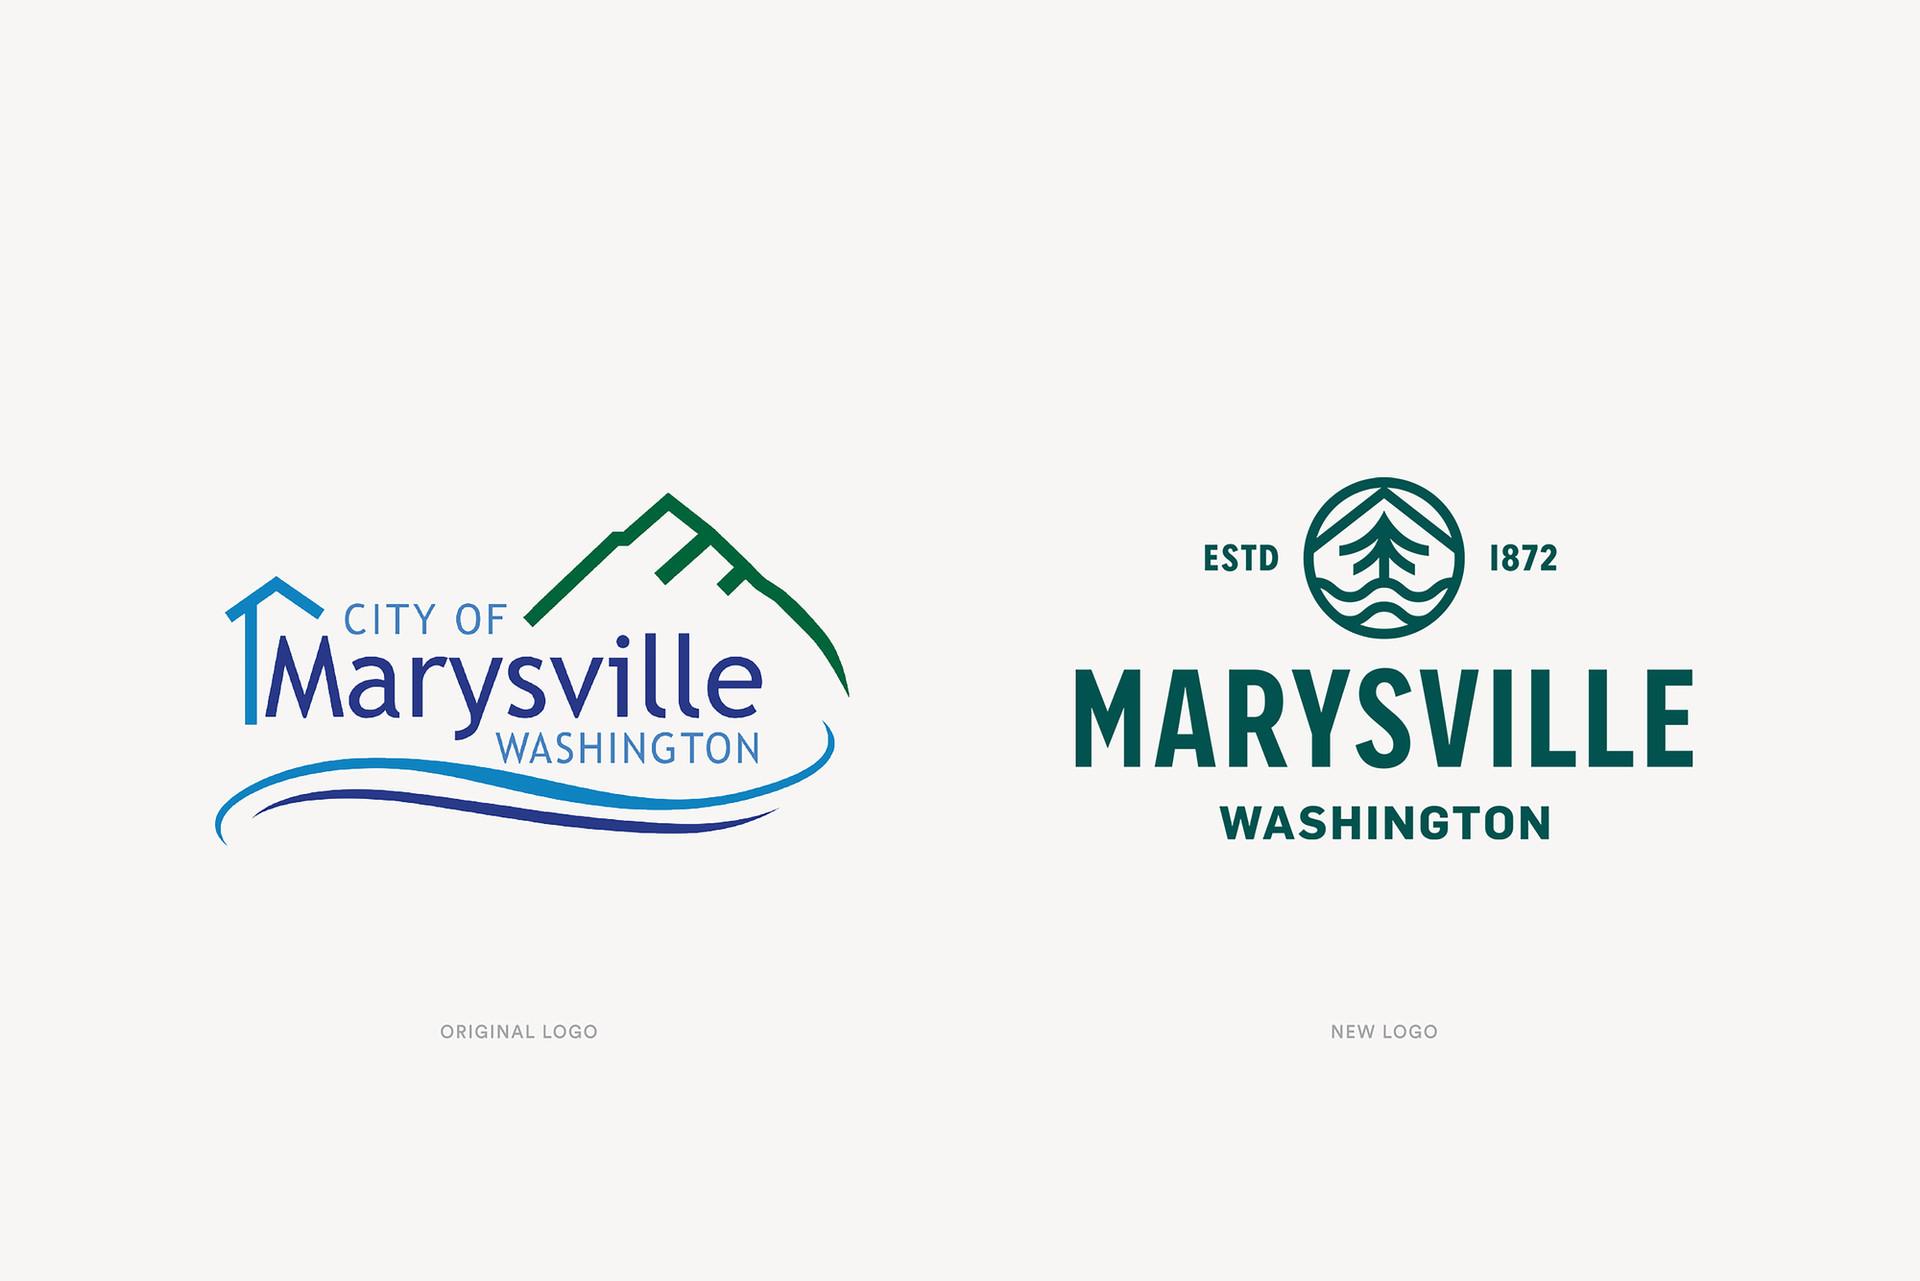 Marysville_3.jpg